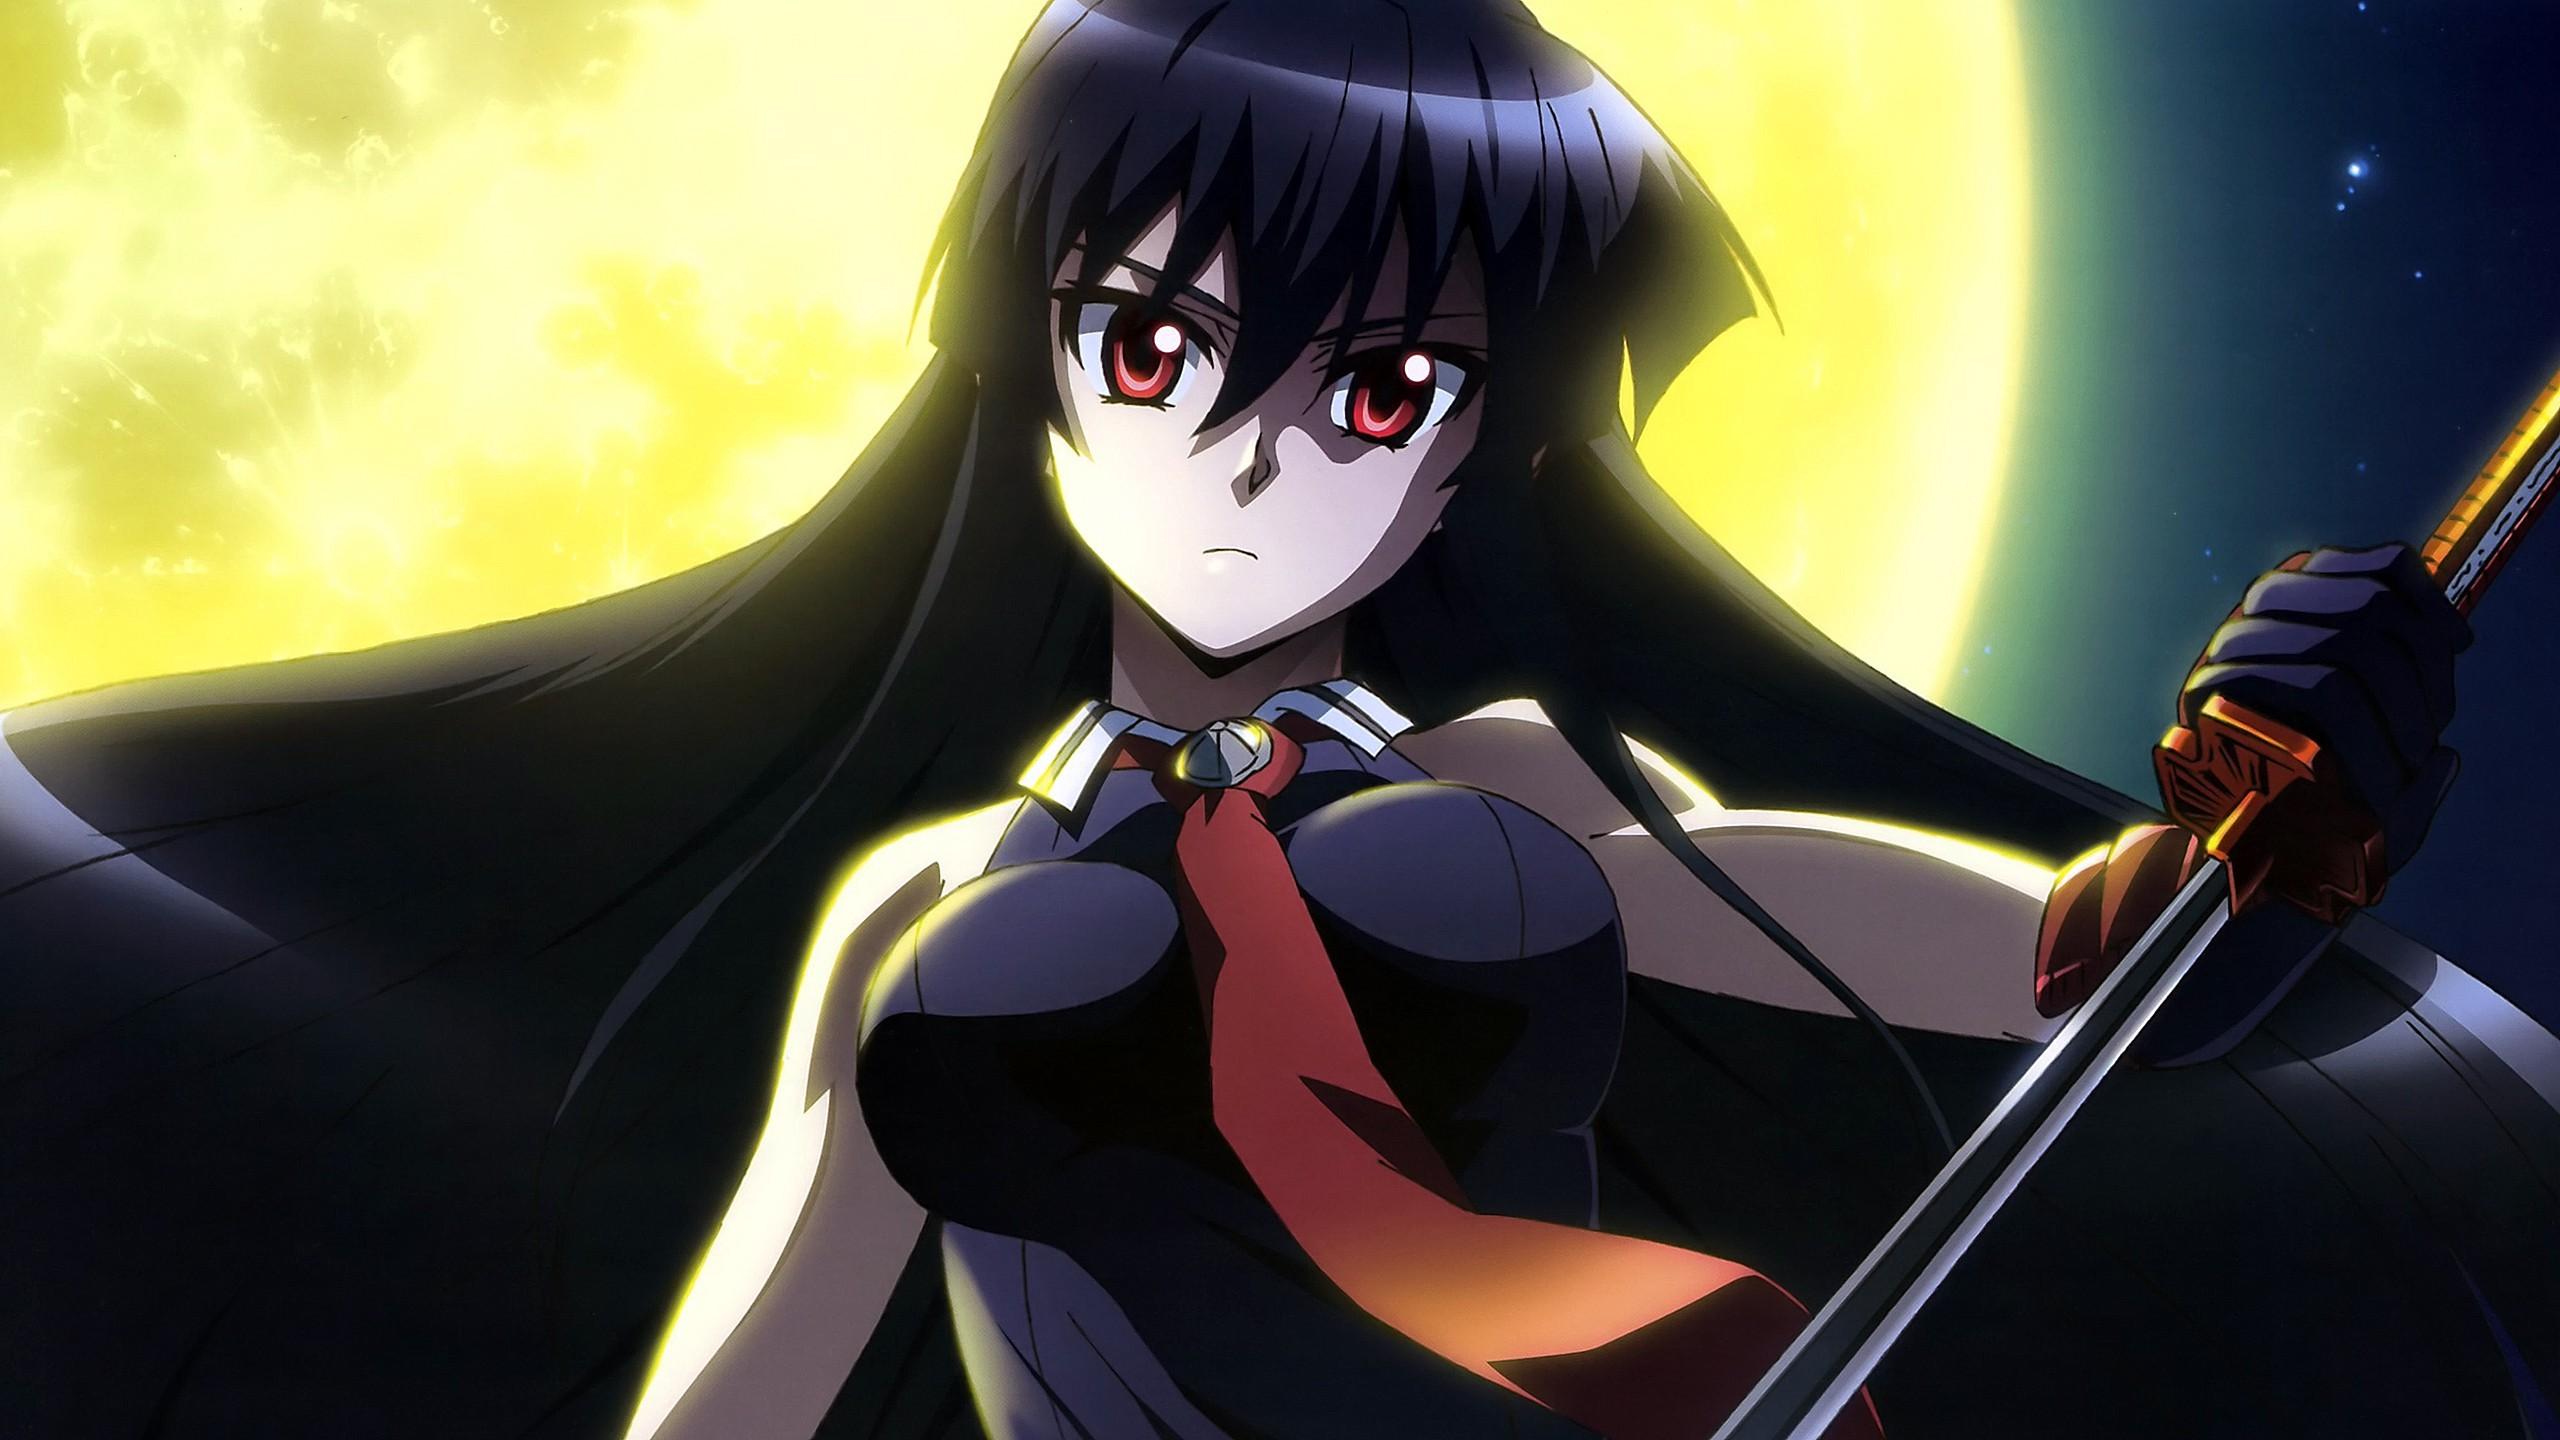 Wallpaper 2560x1440 Px Akame Ga Kill Anime Girls Red